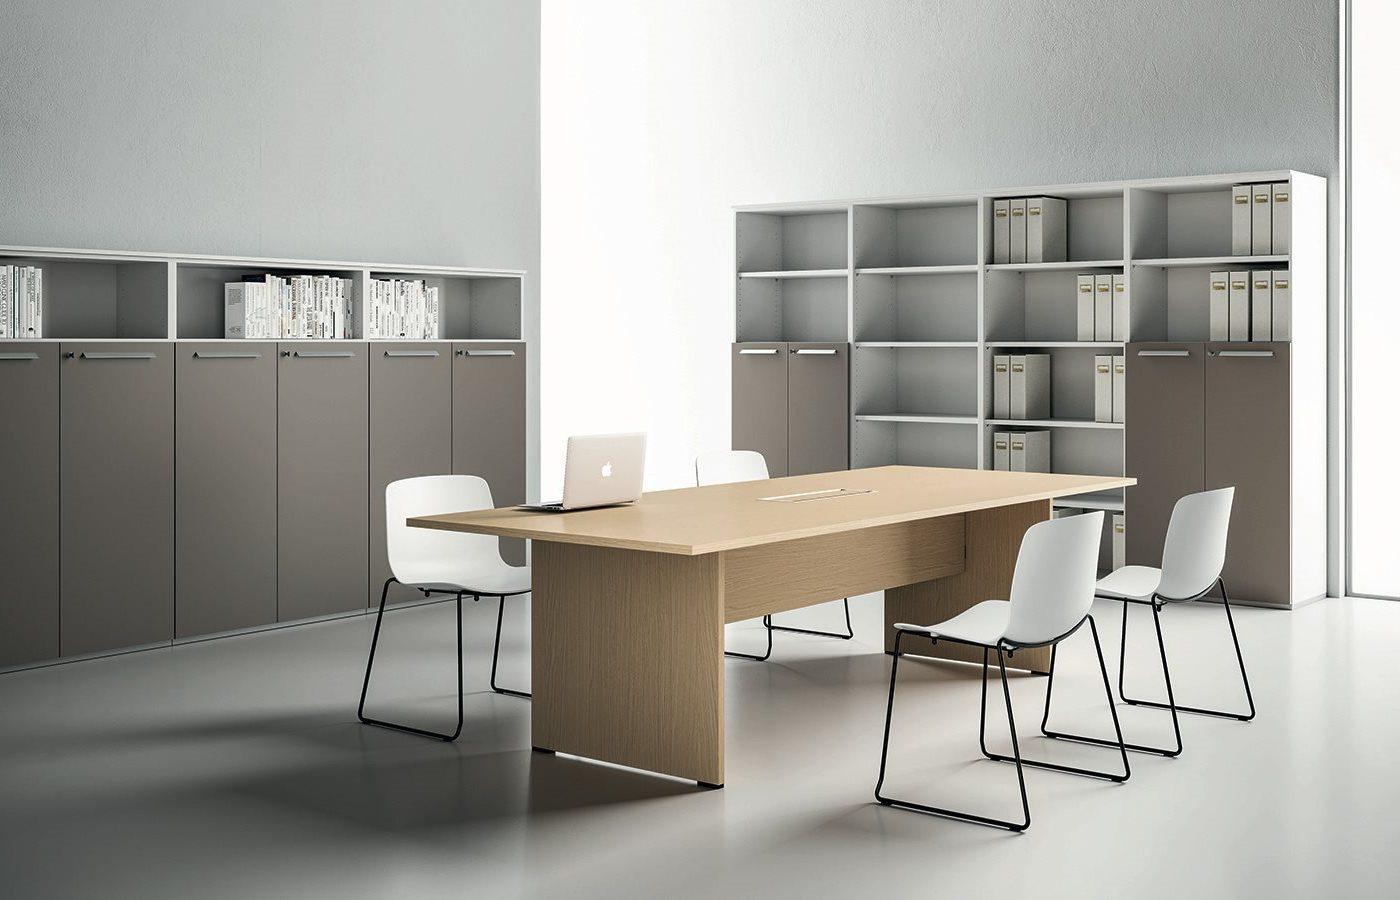 dvo_tavoli_DV990_workstation-table_gallery_18_zoom